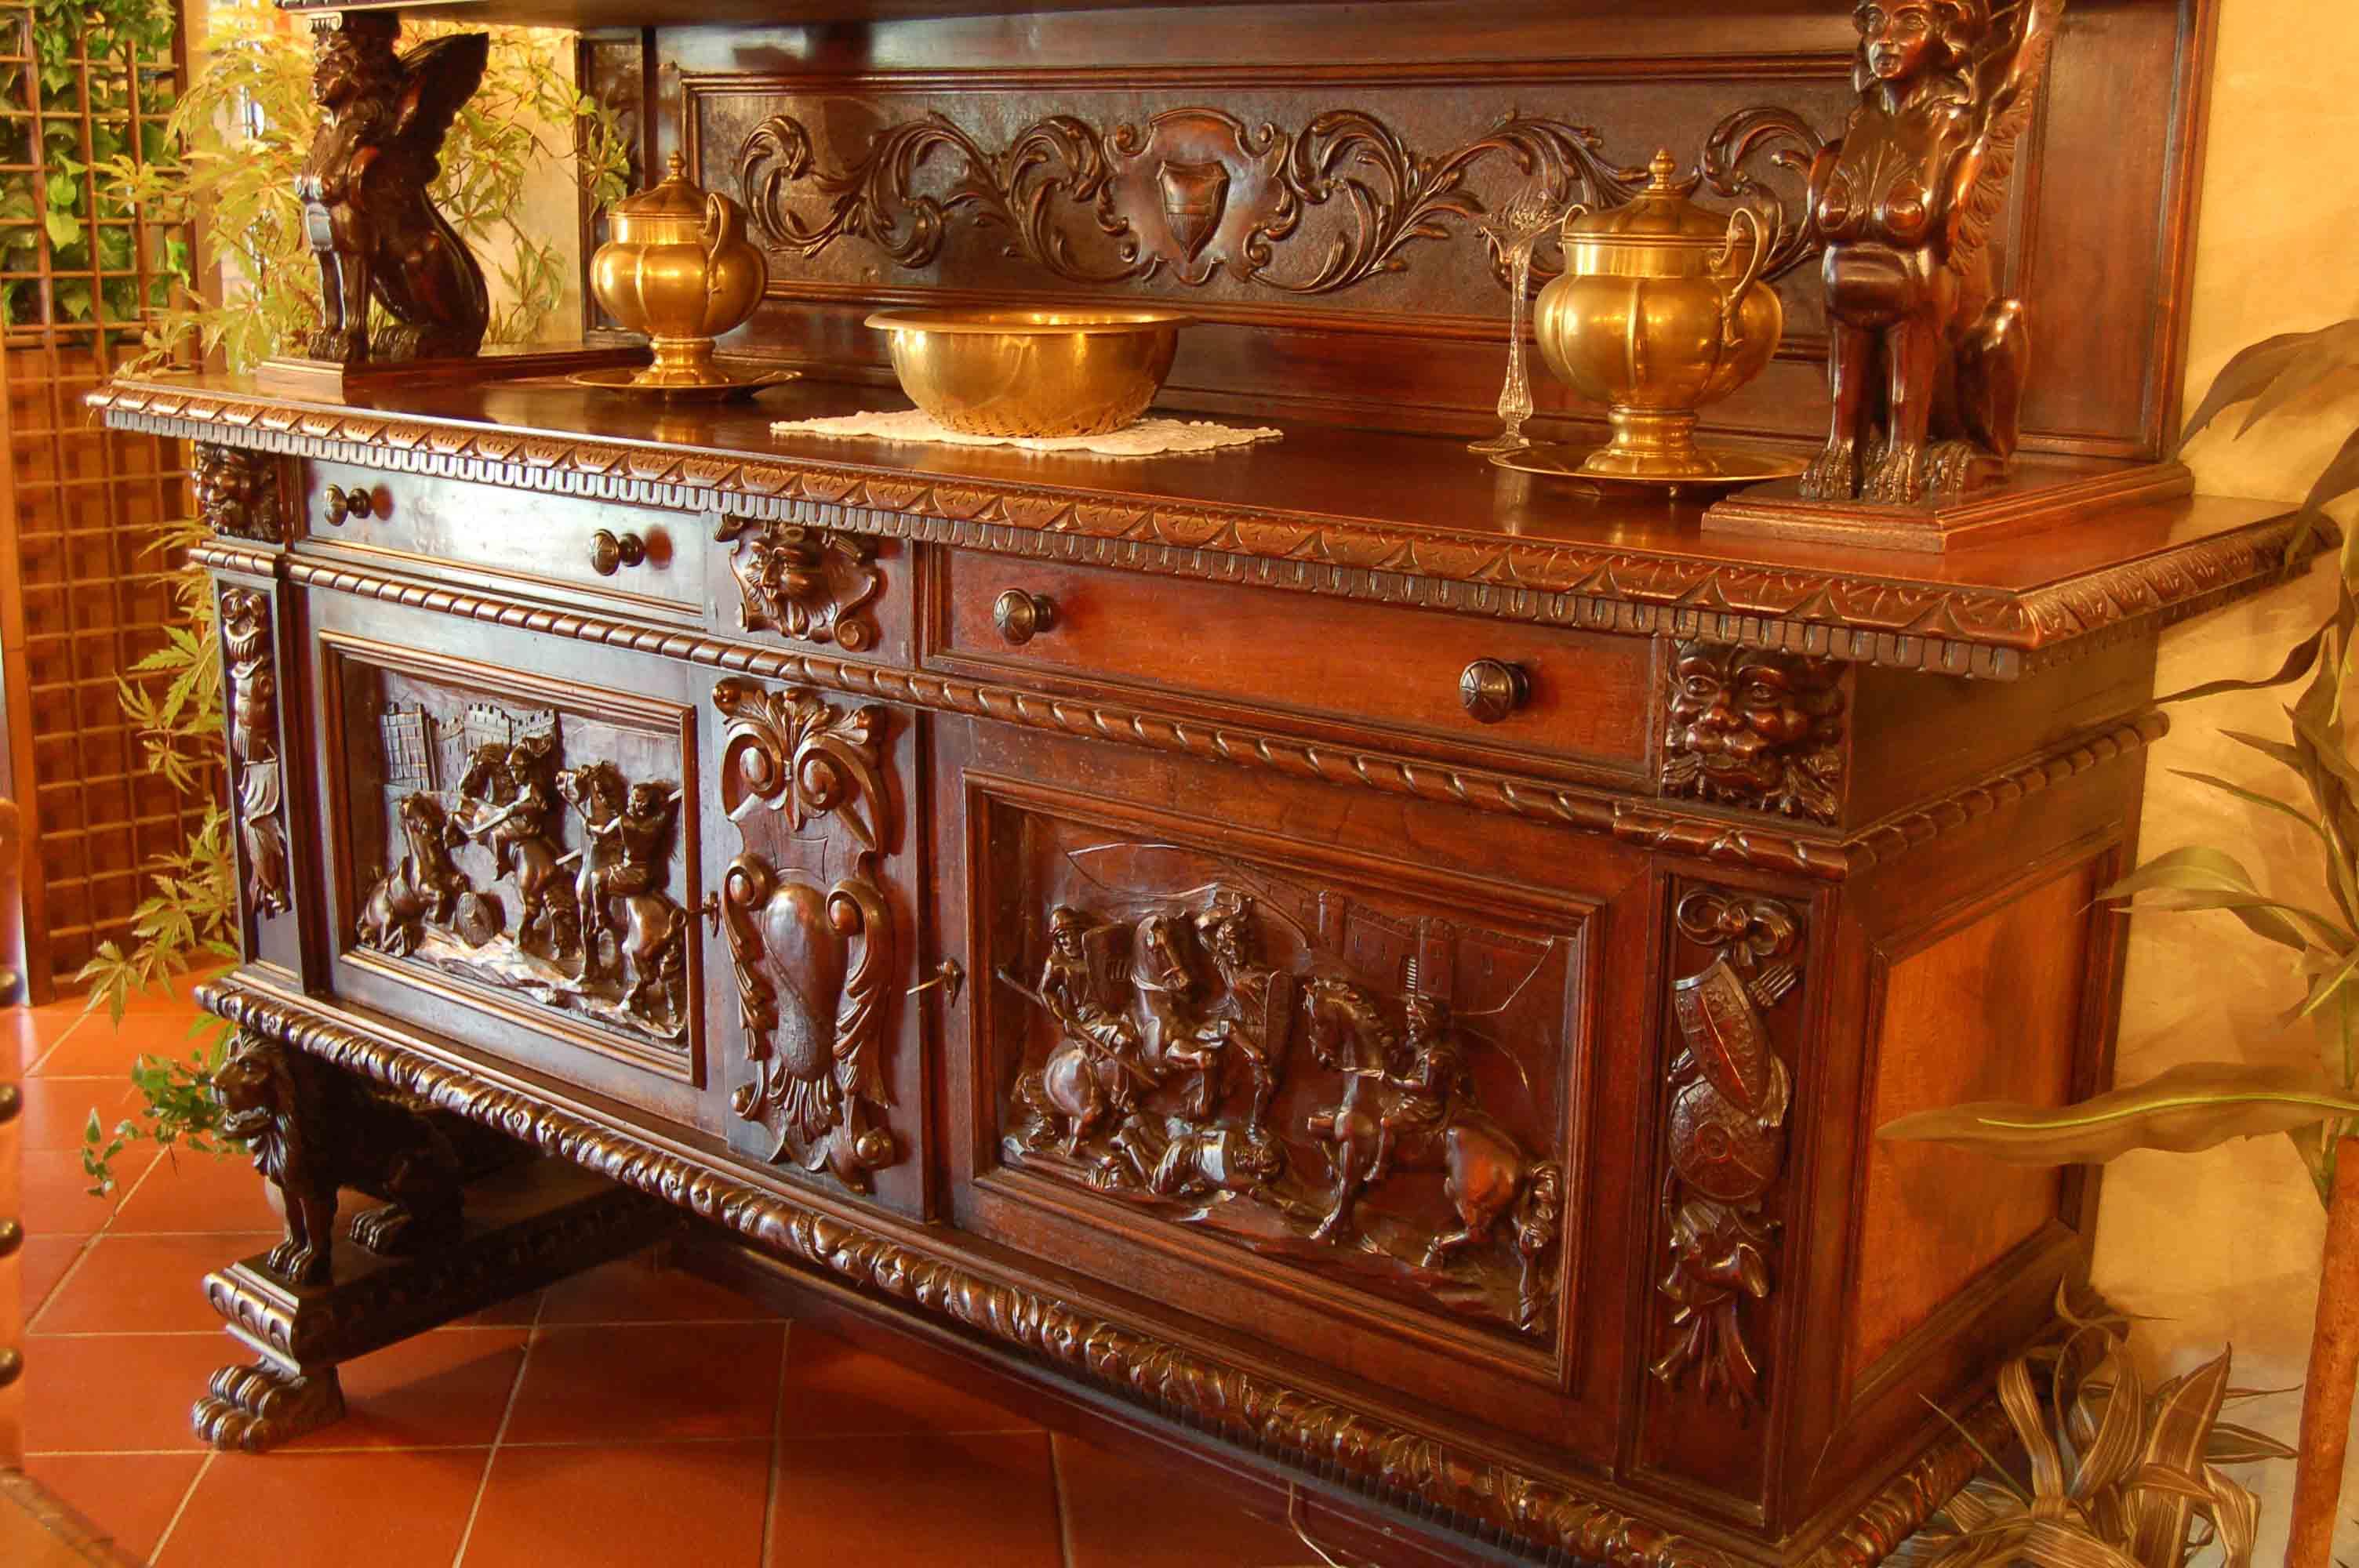 Vendita Mobili Antichi  Acquisto mobili antichi